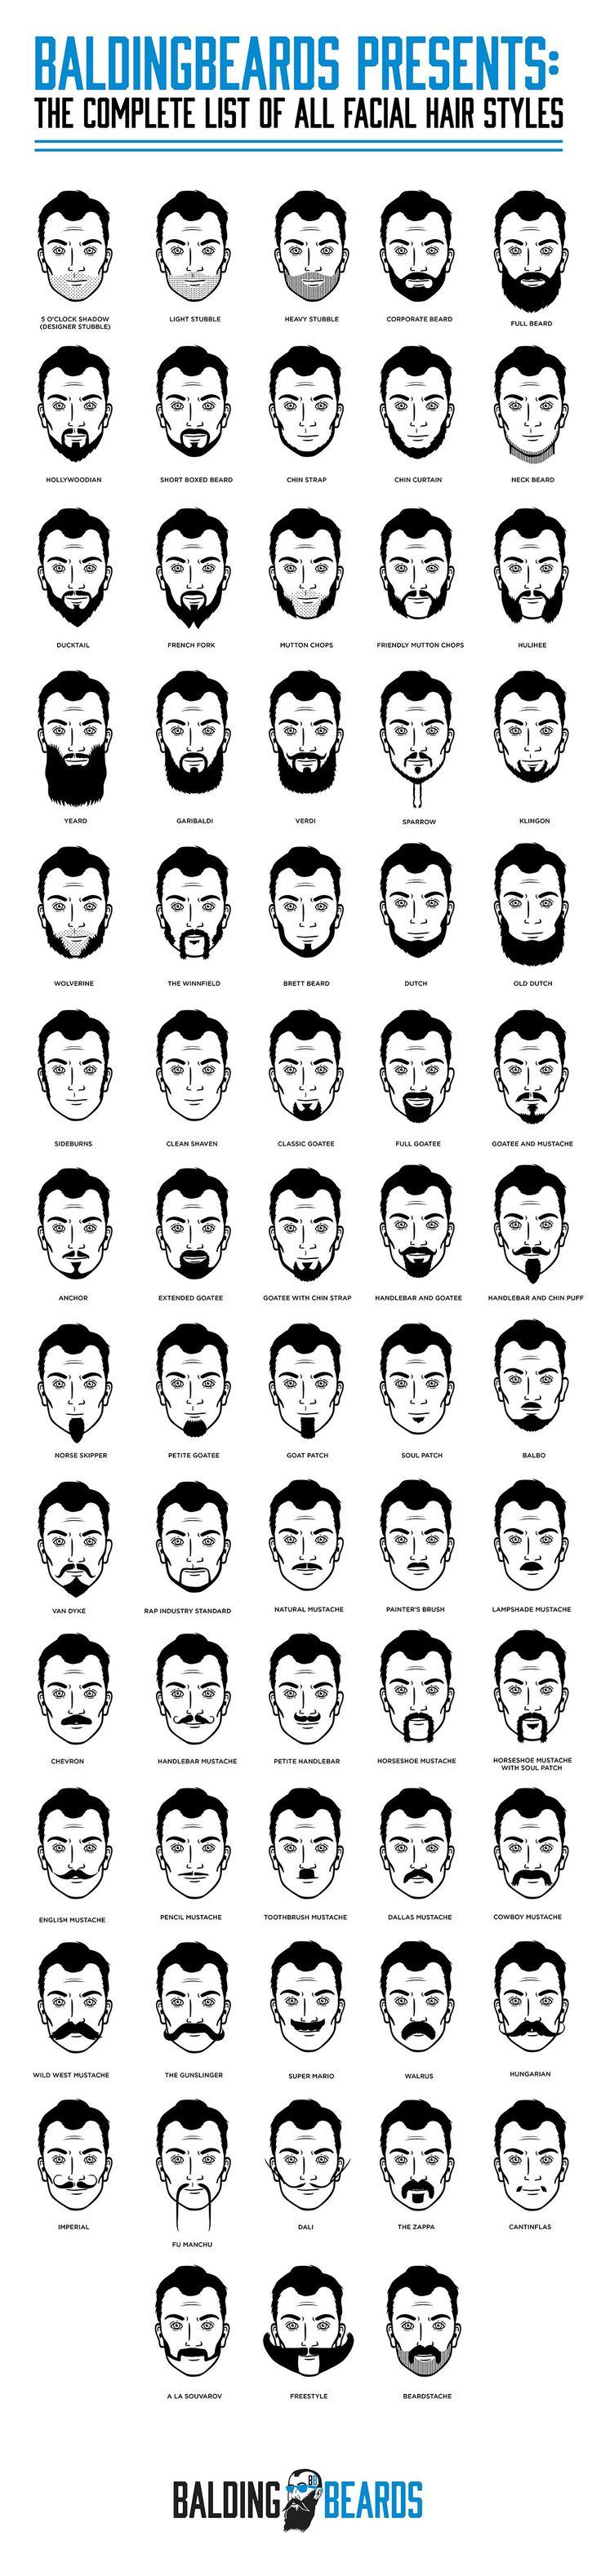 best 25+ hair style for men ideas on pinterest | hair style boys